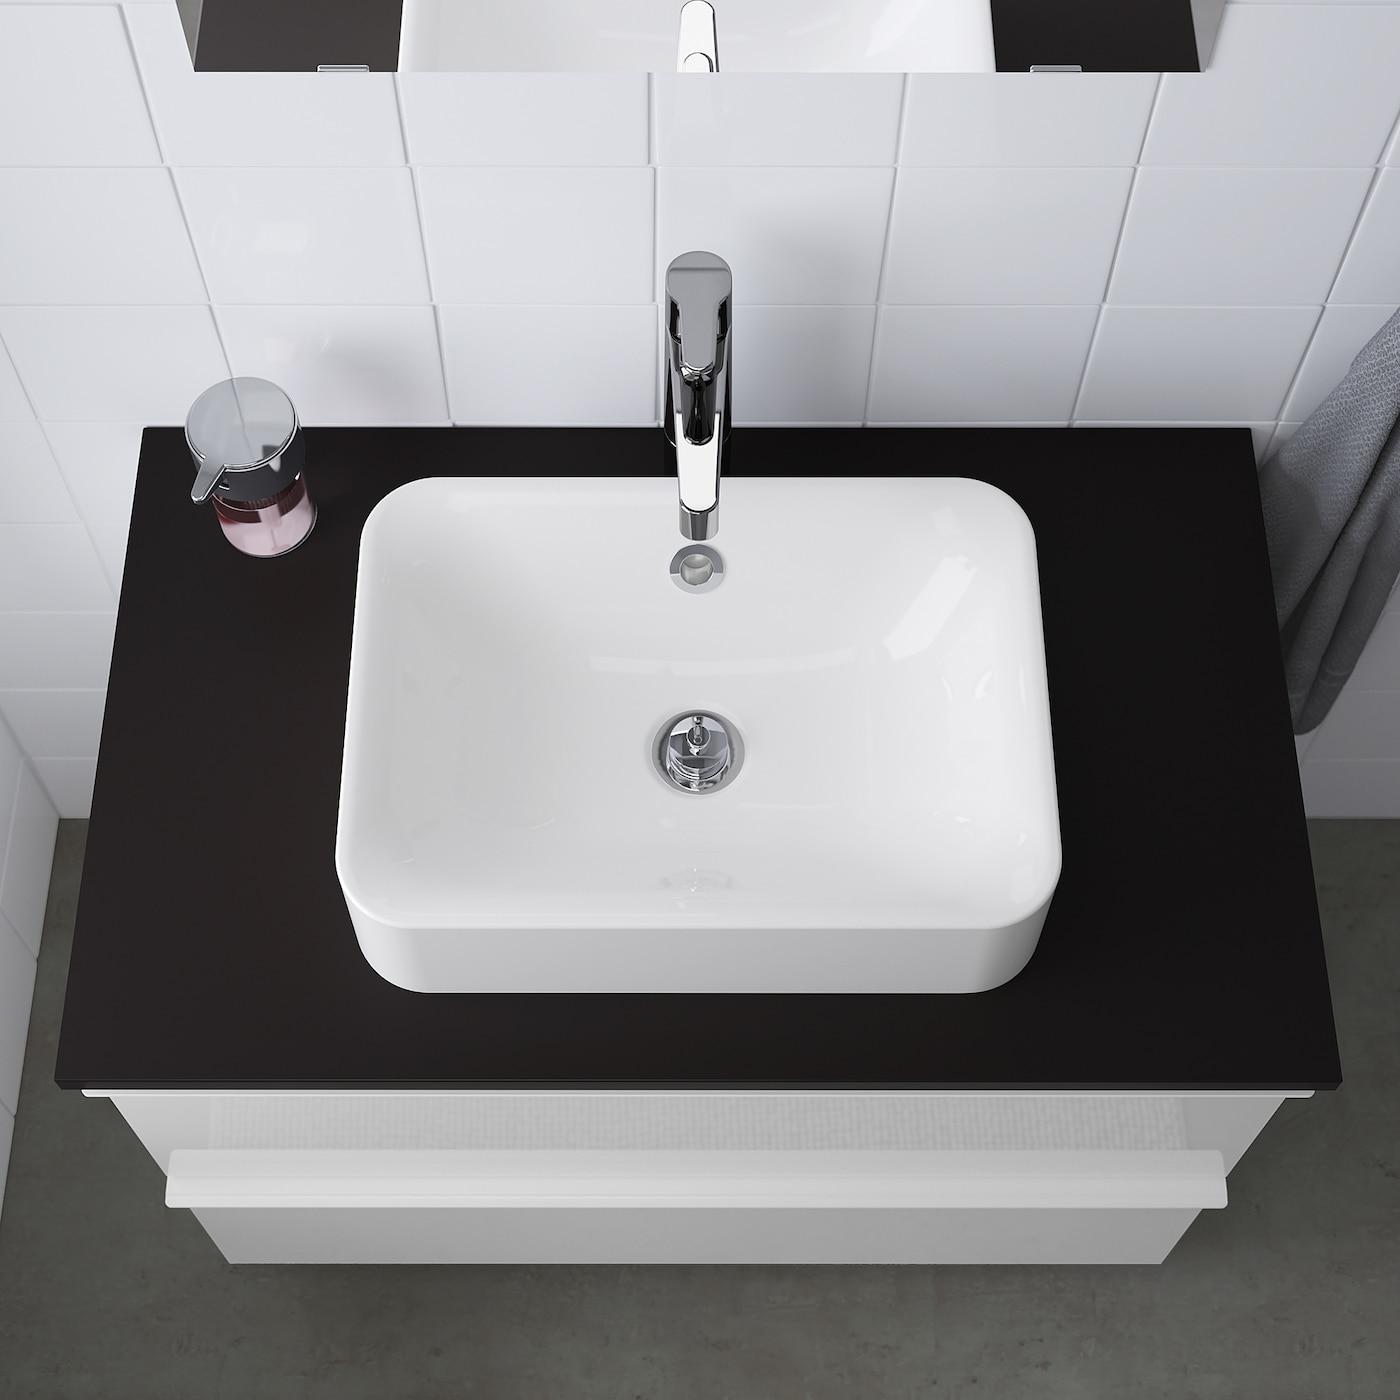 HÖrvik White Countertop Wash Basin